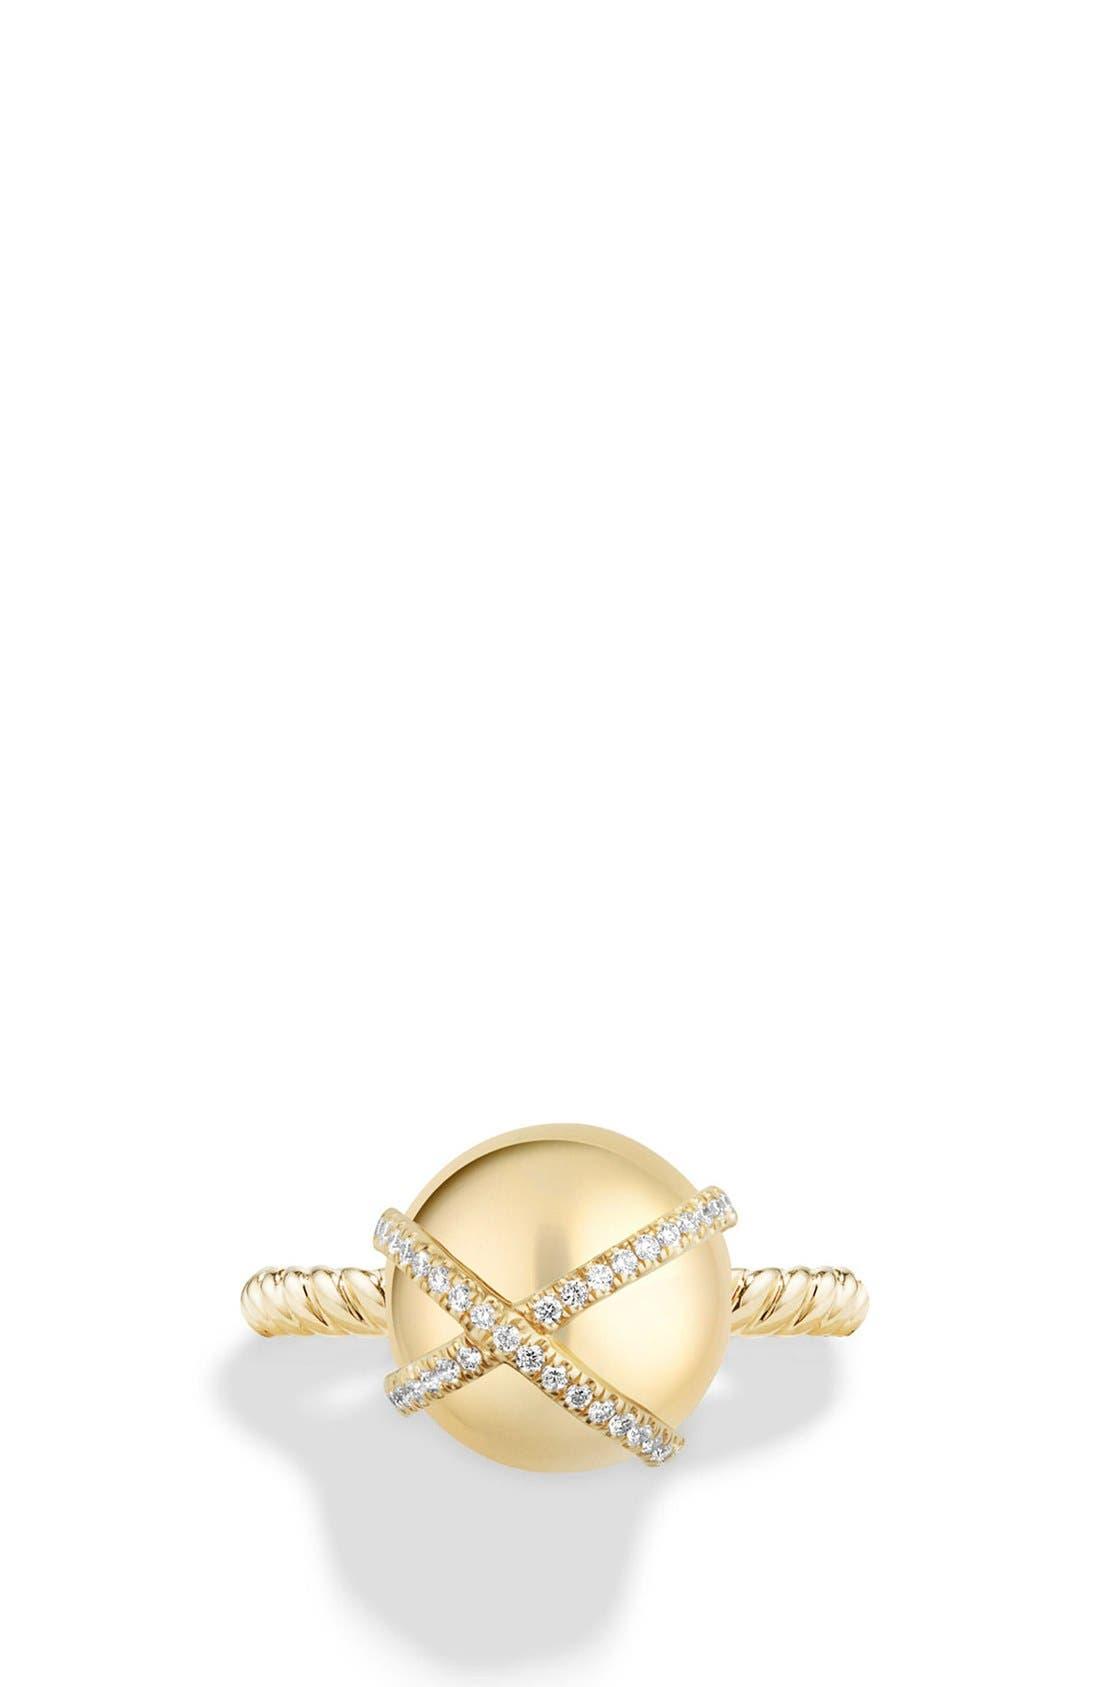 Alternate Image 3  - David Yurman 'Solari' Wrap Ring with Pavé Diamonds in 18k Gold